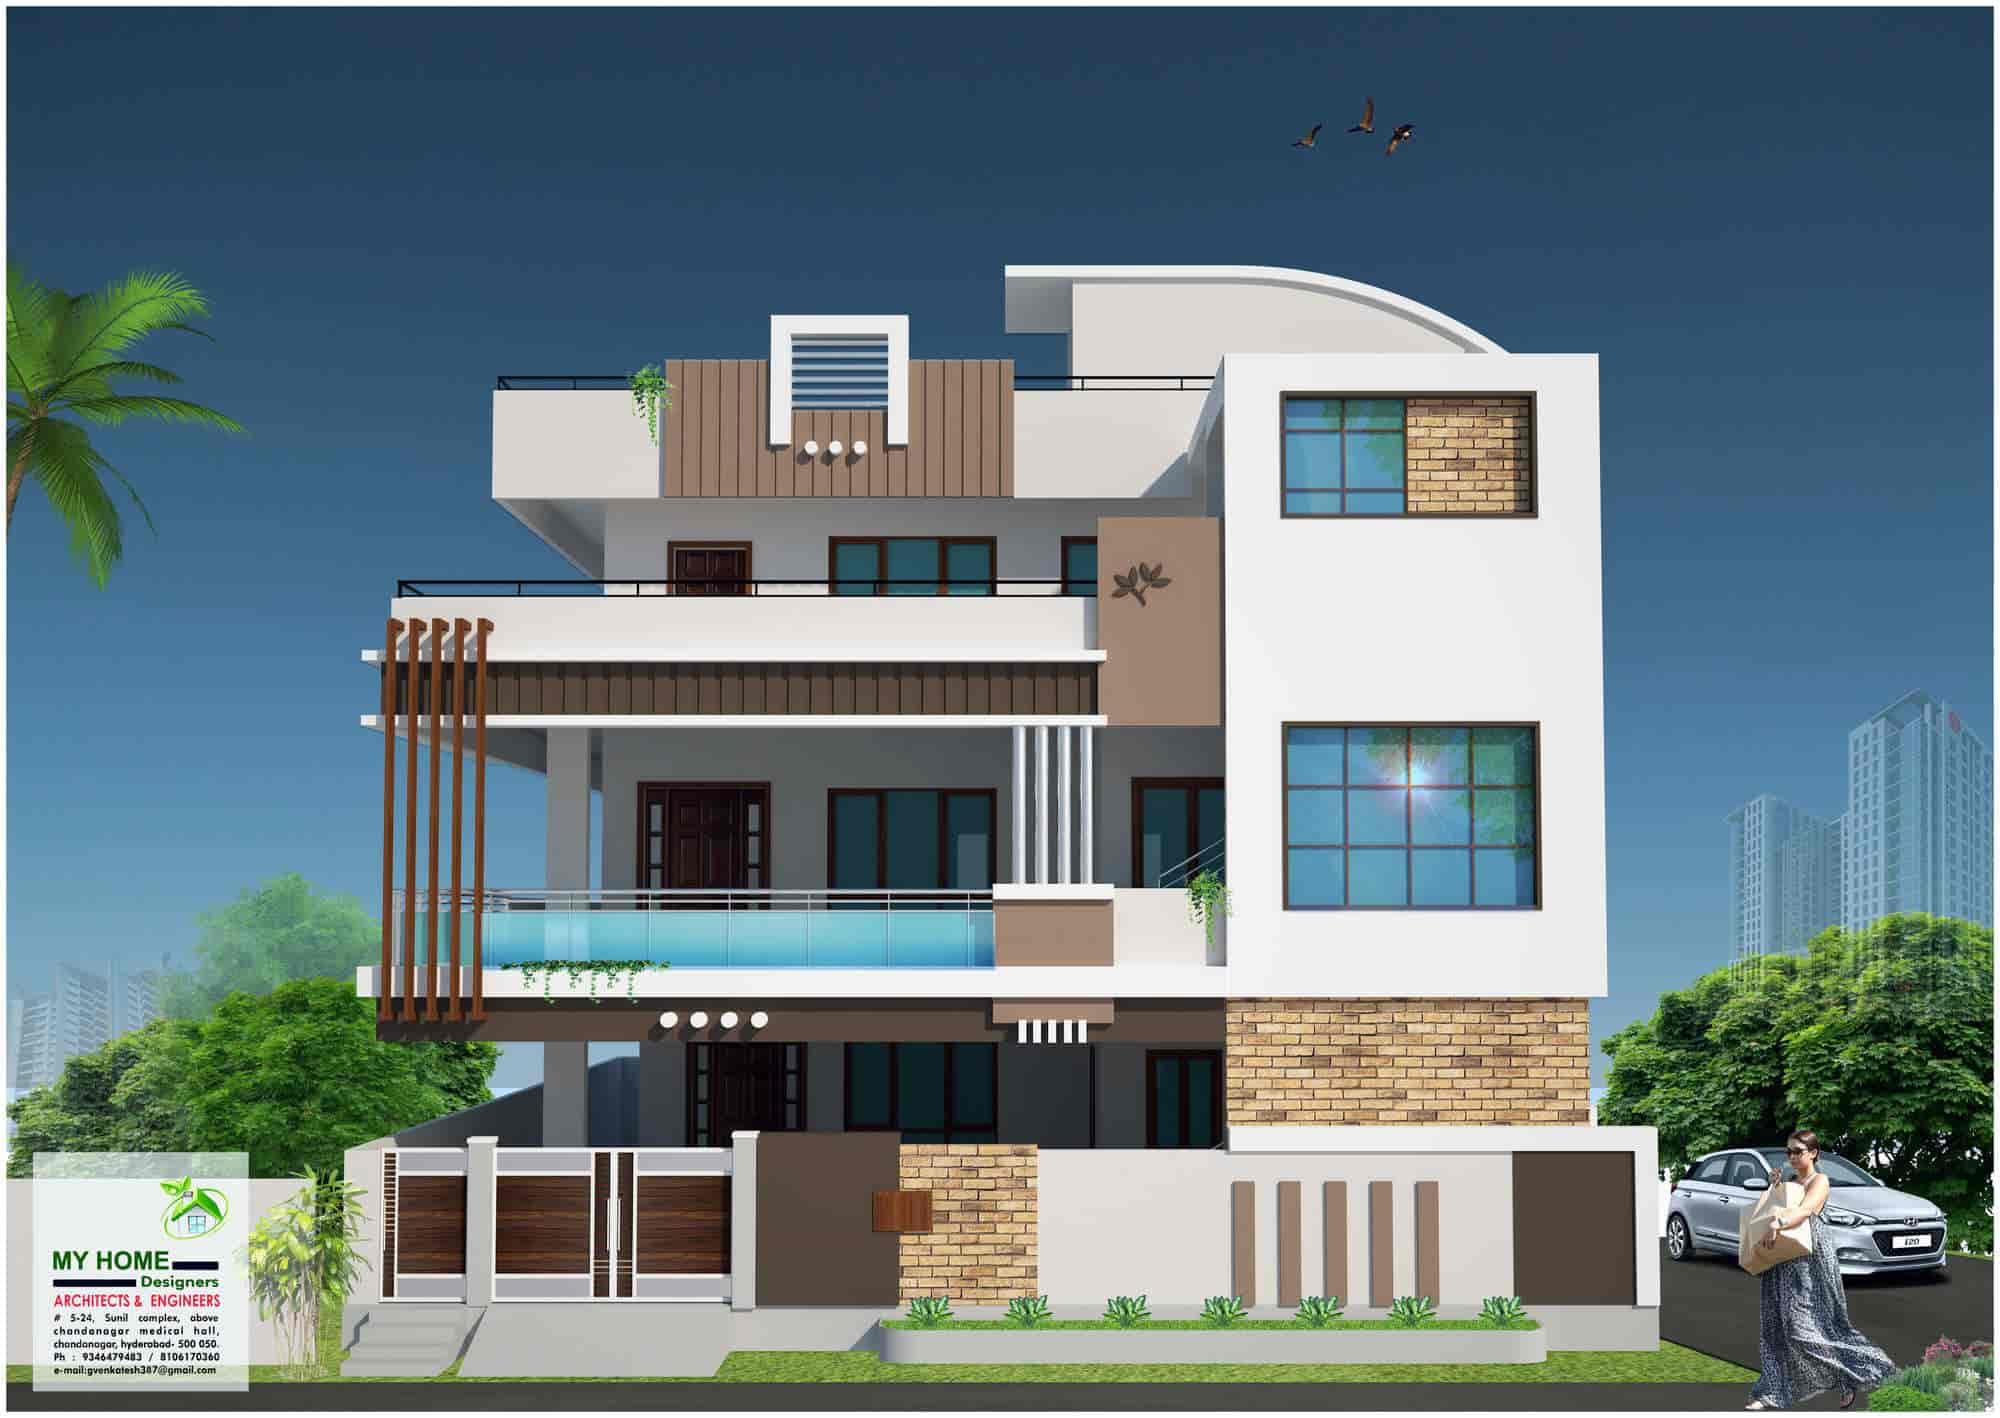 my home designers photos chanda nagar vizag pictures images